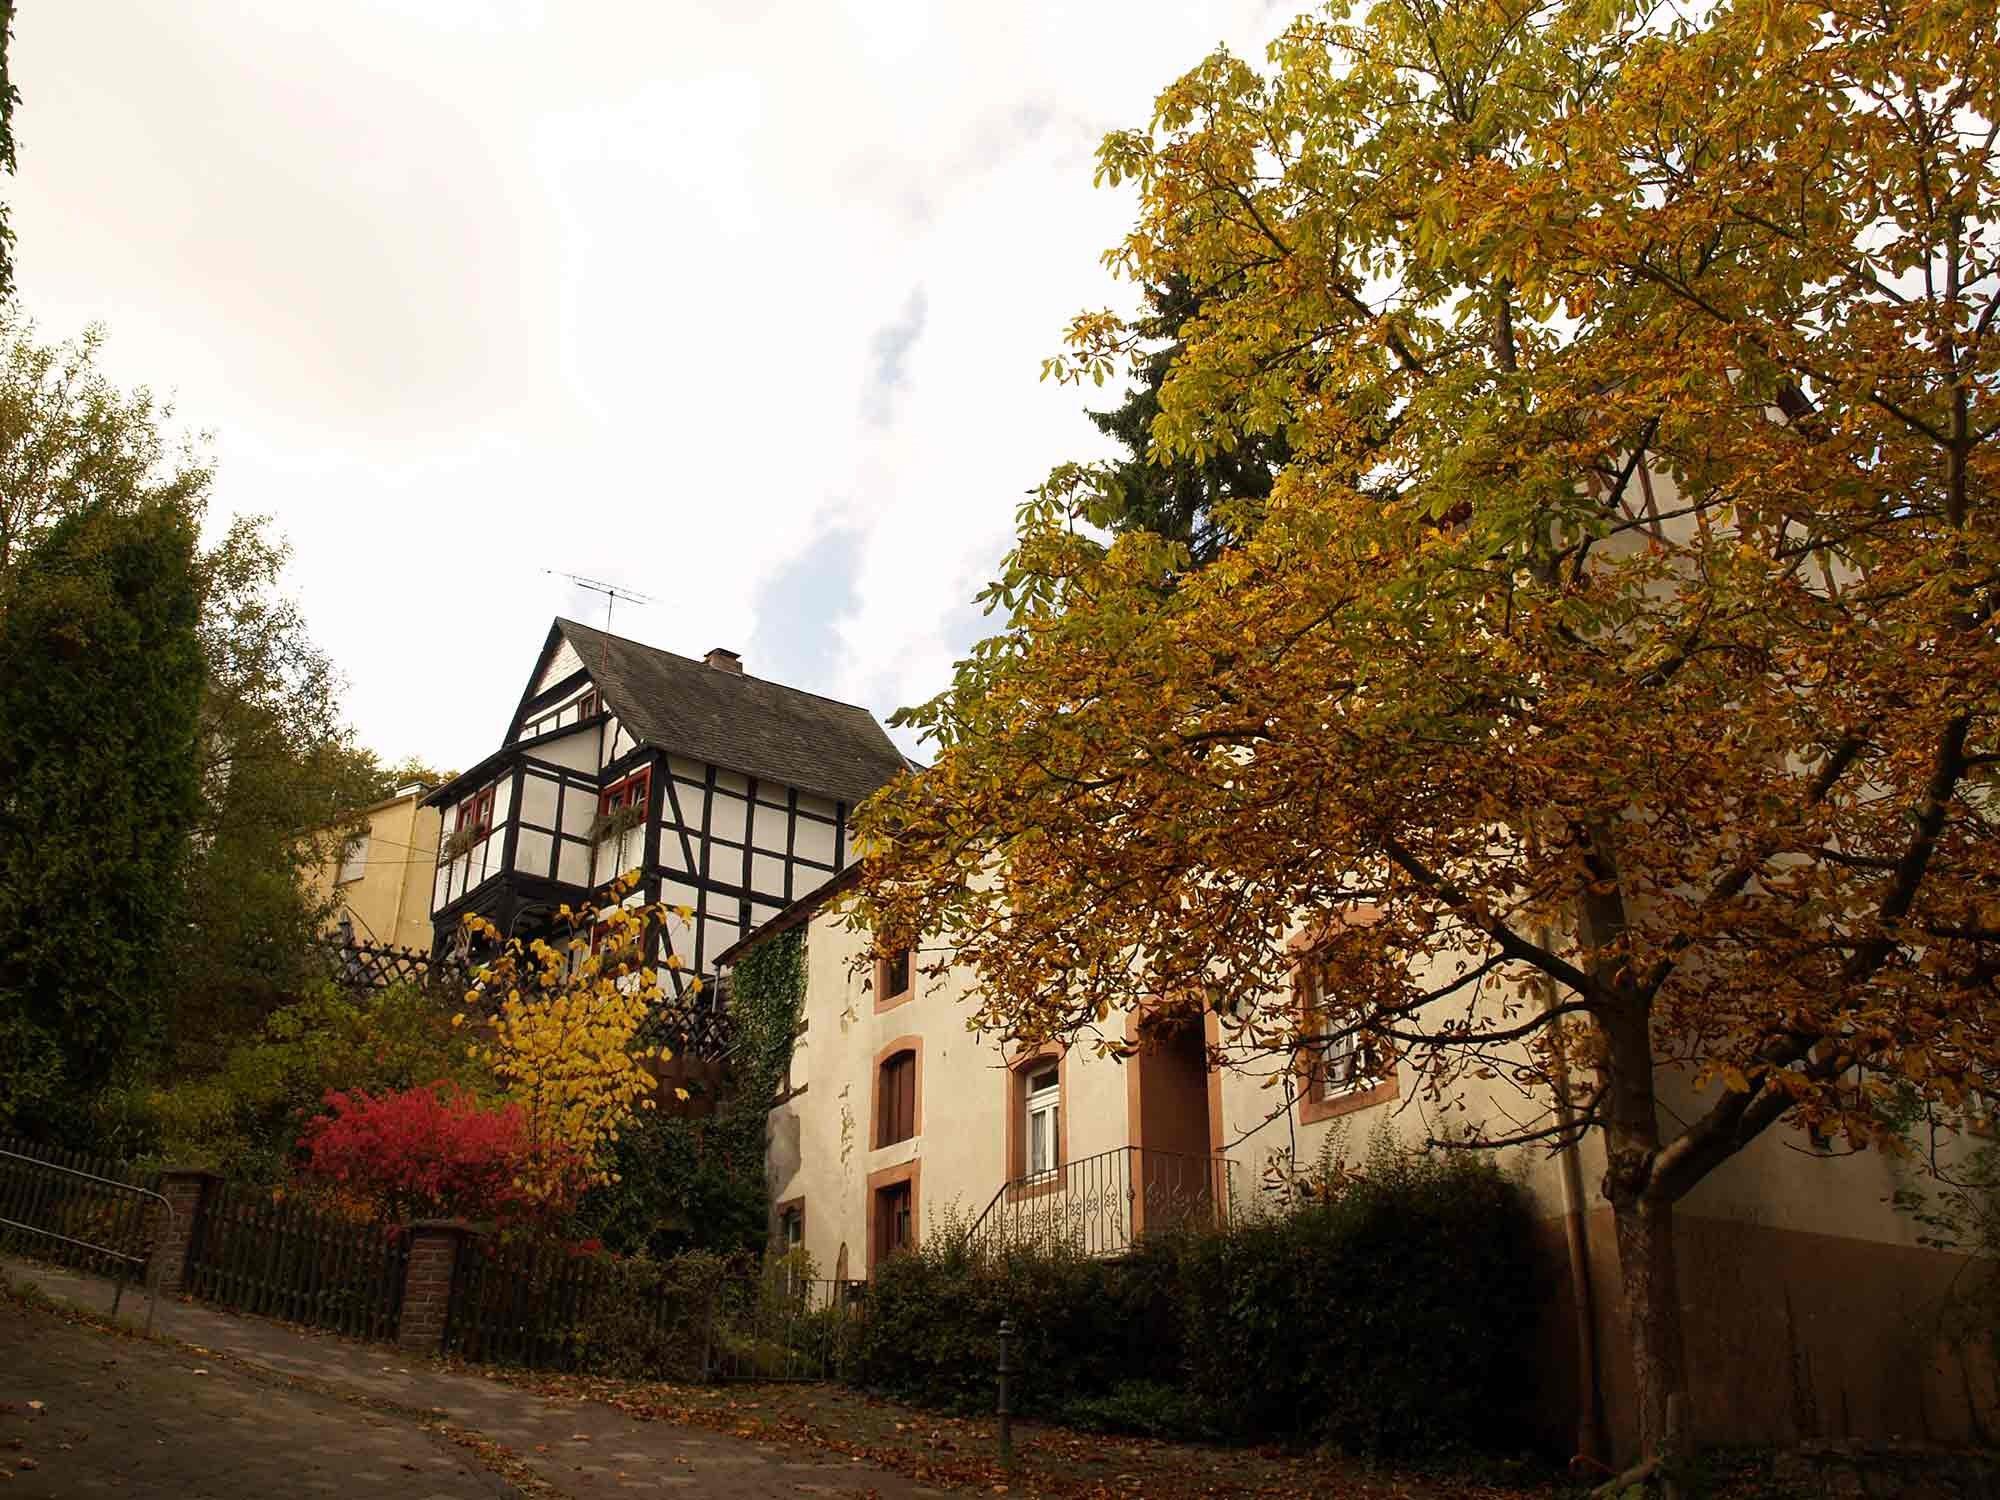 ardenne residences blankenheim 53945 region landscapes city center